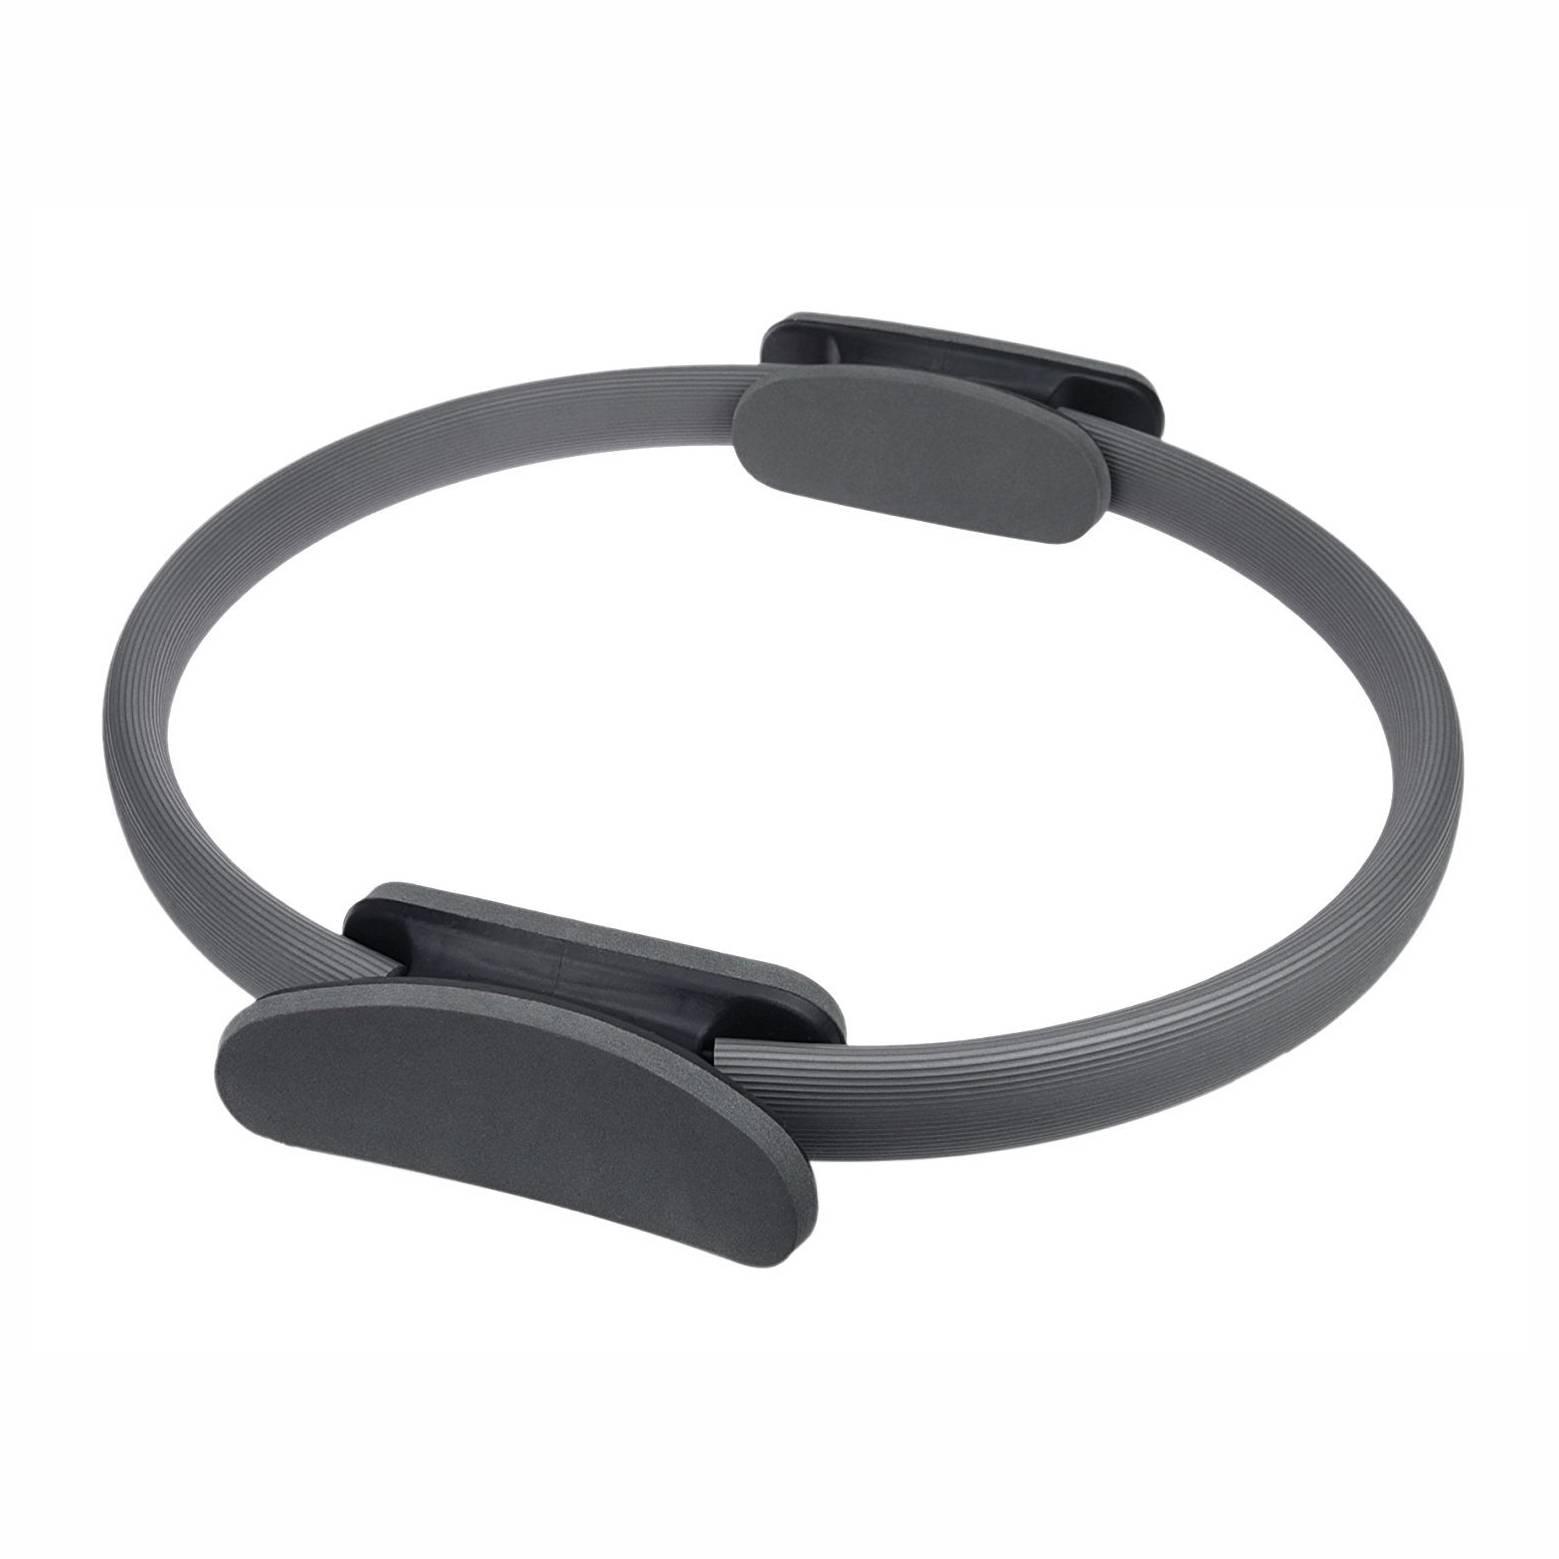 4 farbe Muscle Übung Kit Magie Kreis Übung Fitness Körper Massage Schleife Dual Grip Yoga Pilates Ring Verlieren Gewicht Ausrüstung